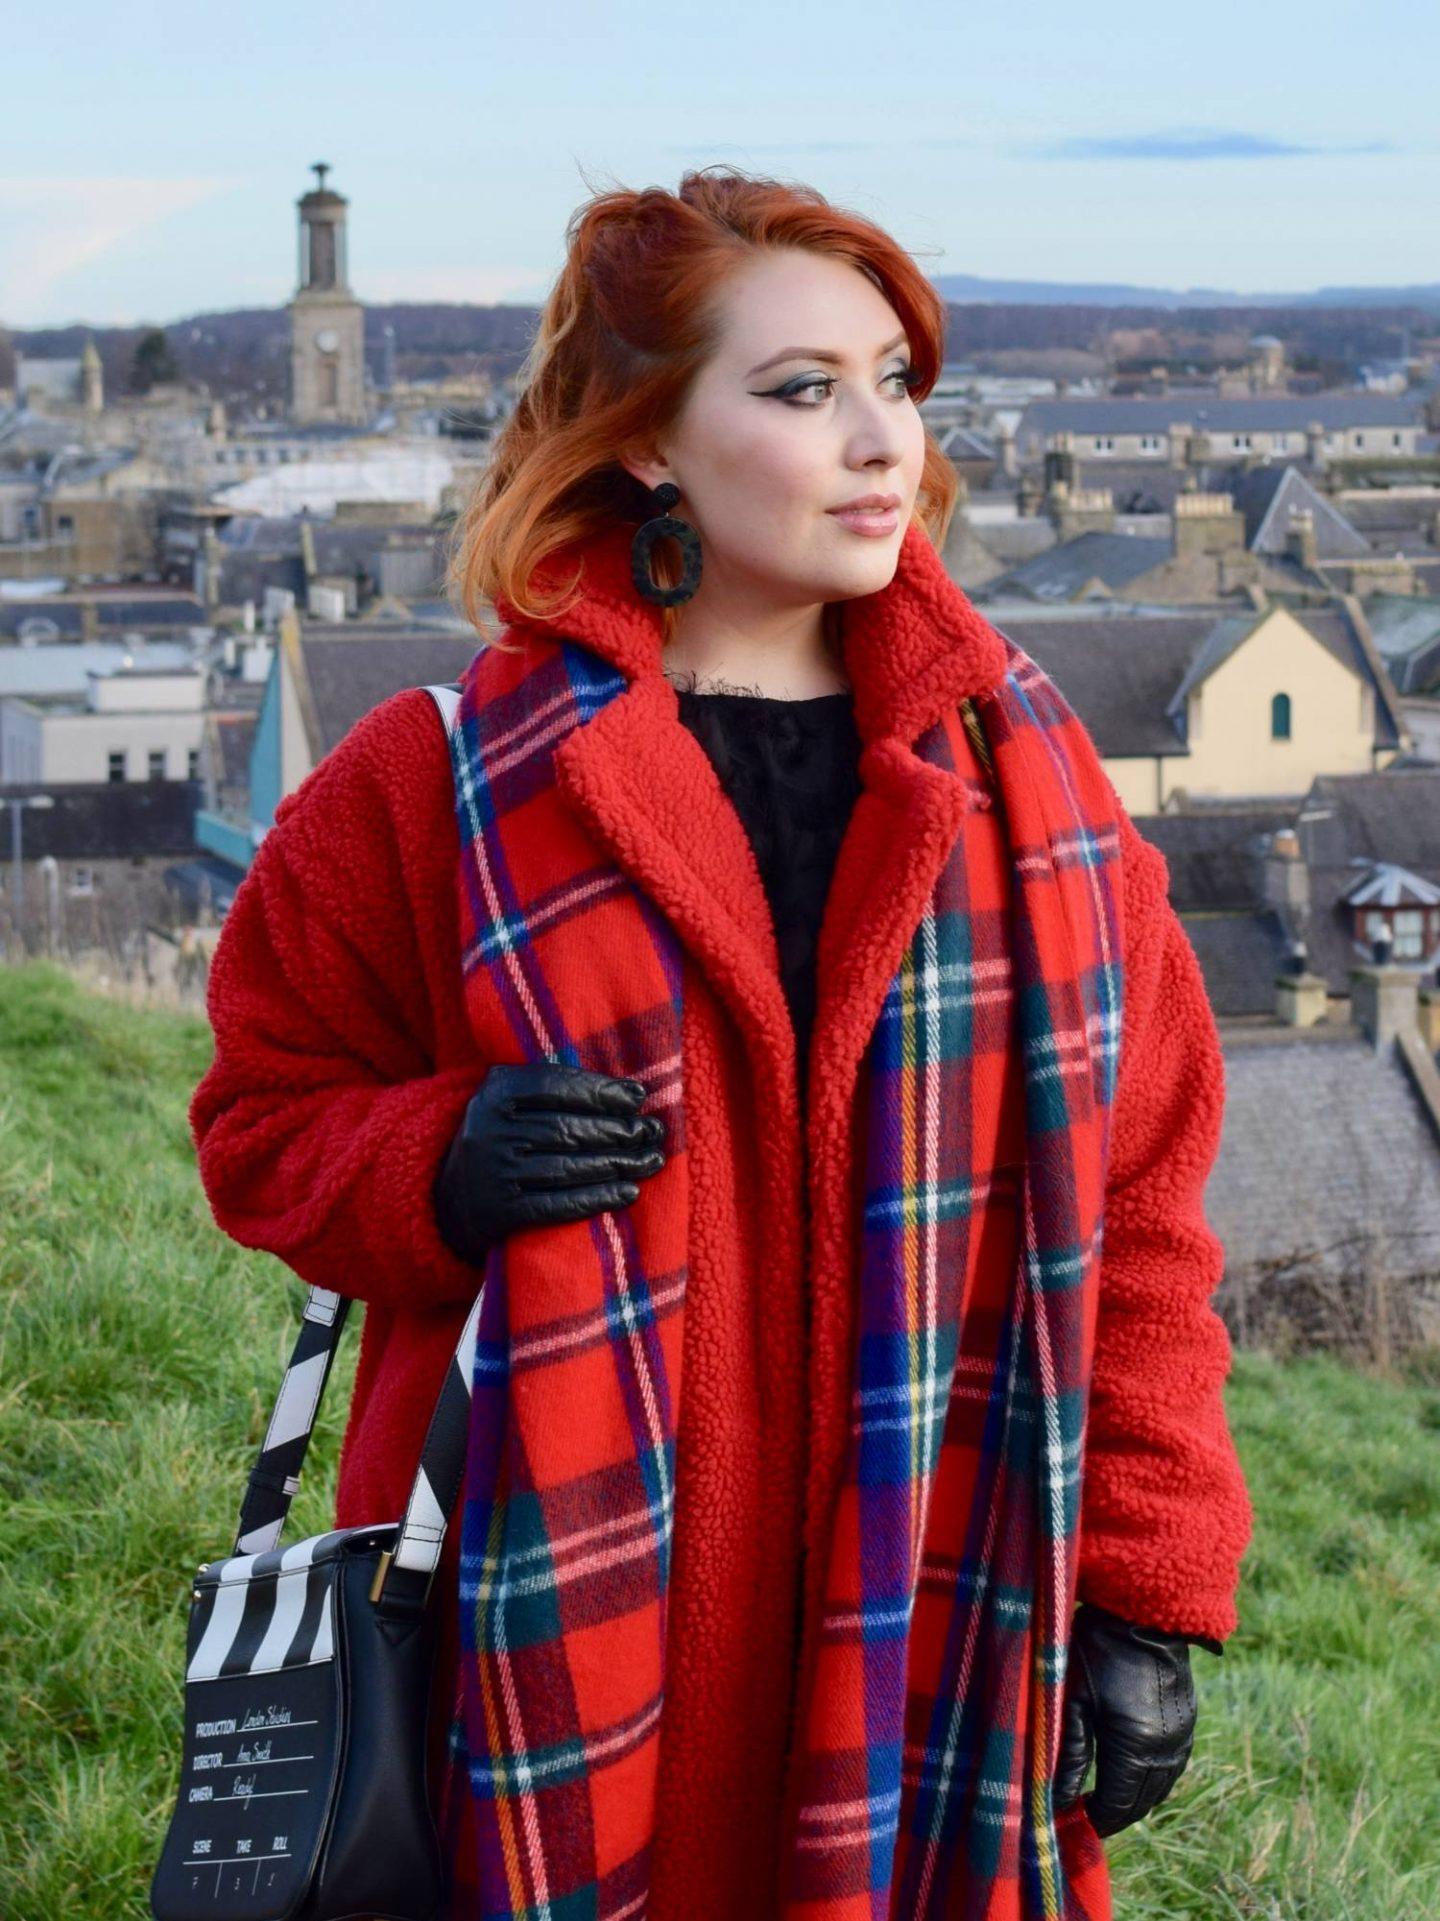 Twenty-Something City cosy winter fashion wearing red coat and tartan blanket scarf